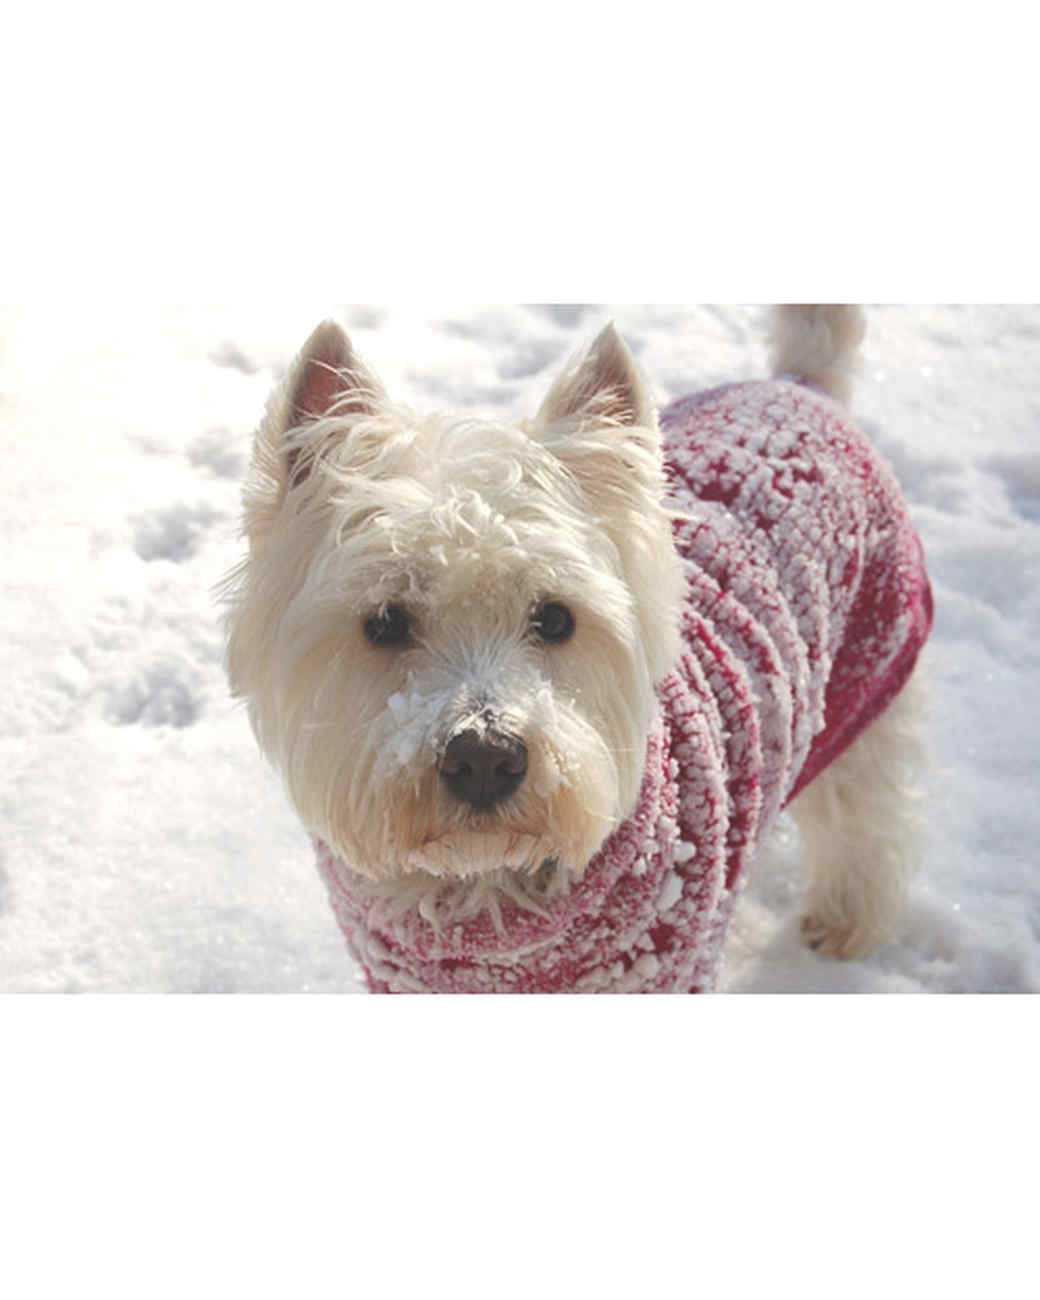 pets_snowangels_7308099_122717_10938635.jpg